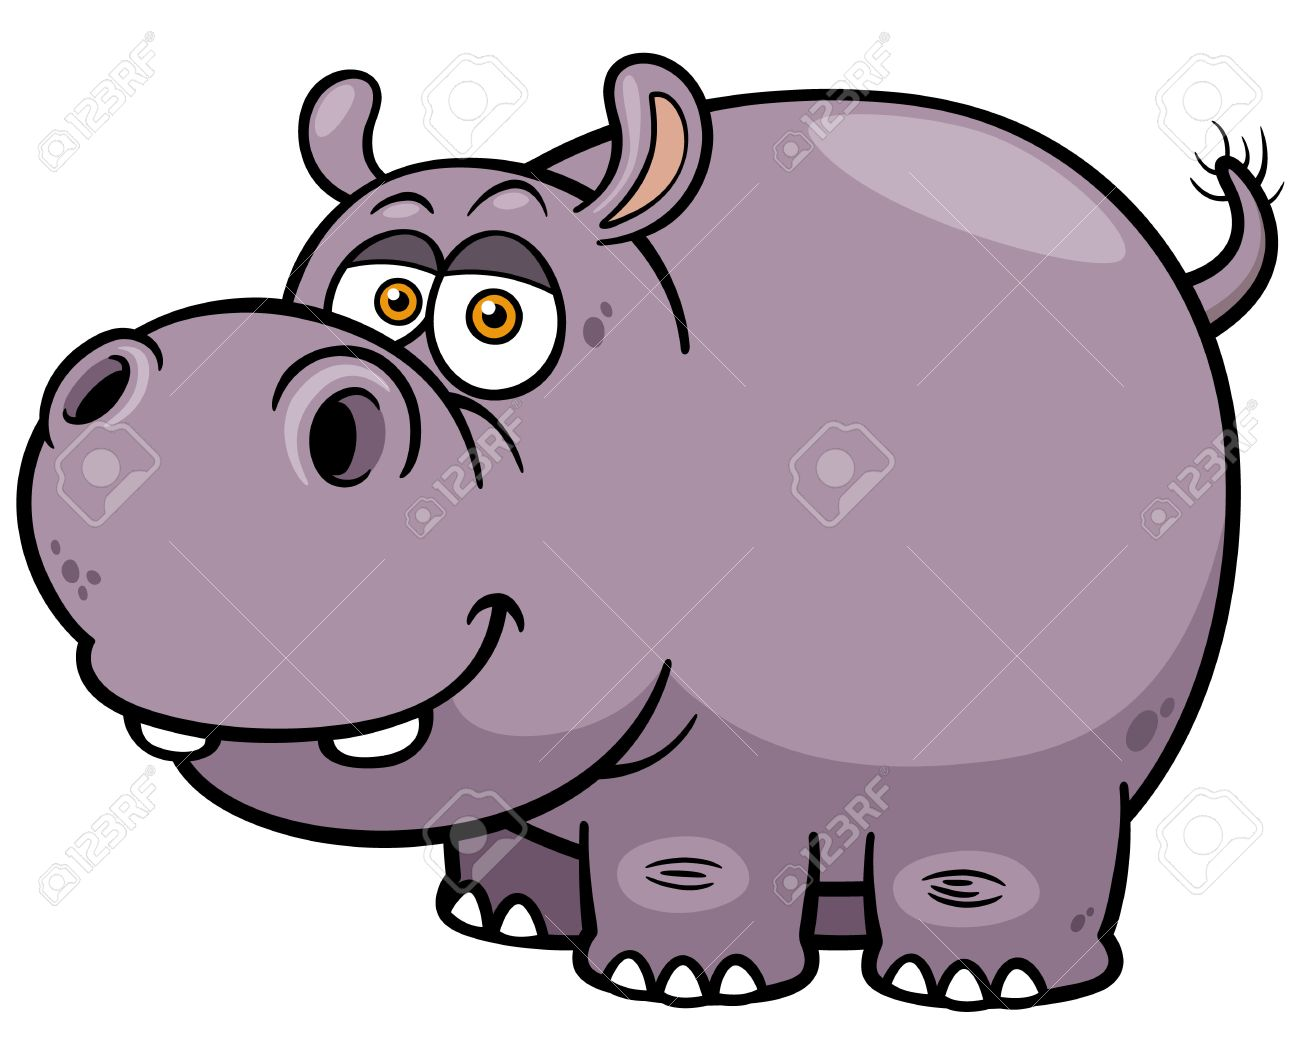 hight resolution of illustration of cartoon hippopotamus stock vector 28869785